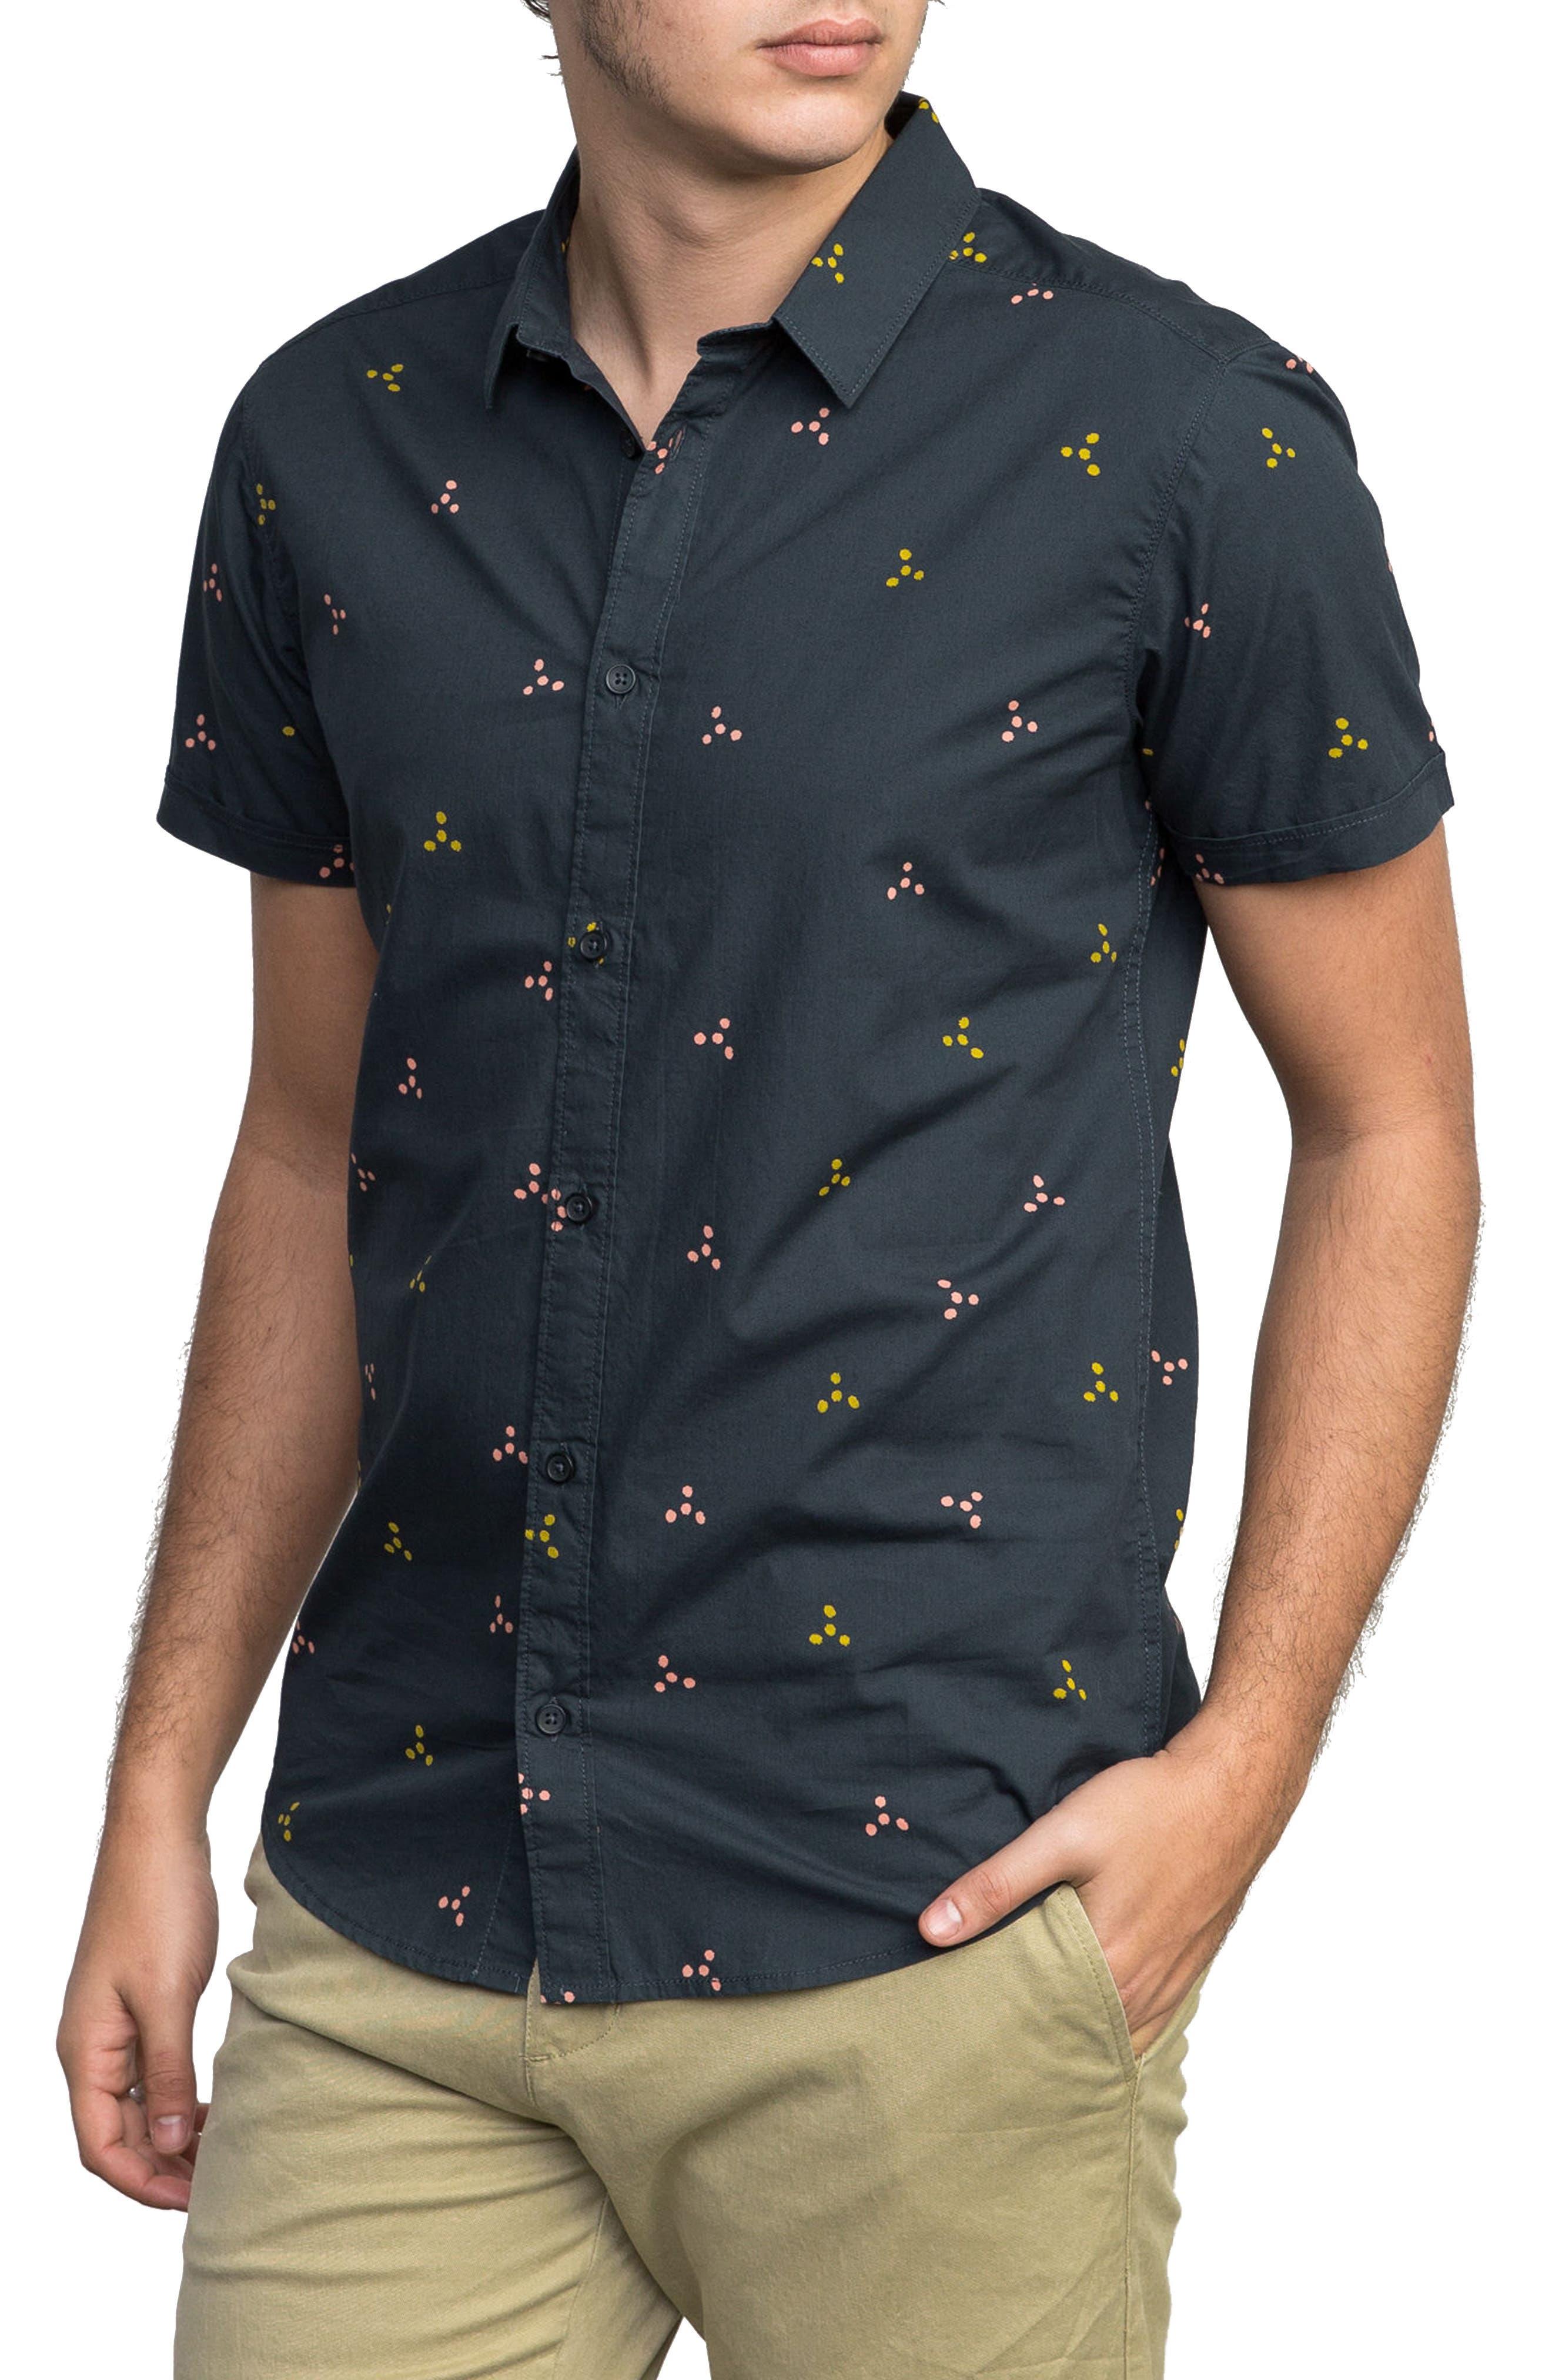 Tridot Woven Shirt,                             Alternate thumbnail 3, color,                             020